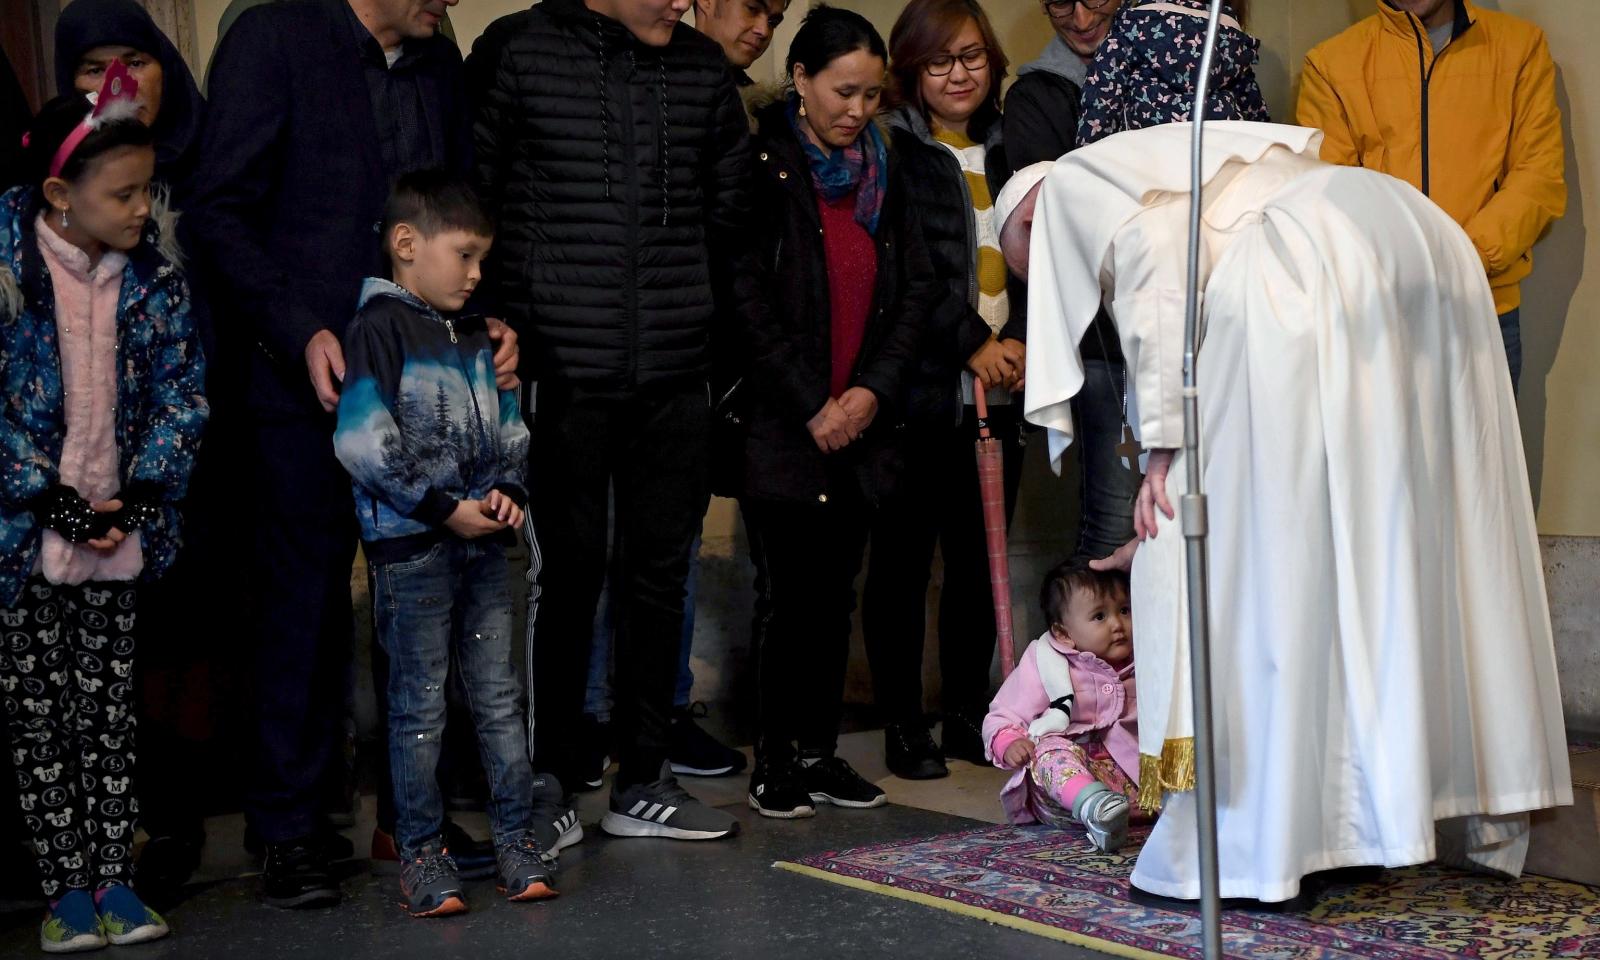 Spotkanie papieża Franciszka z imigrantami EPA/ETTORE FERRARI / POOL